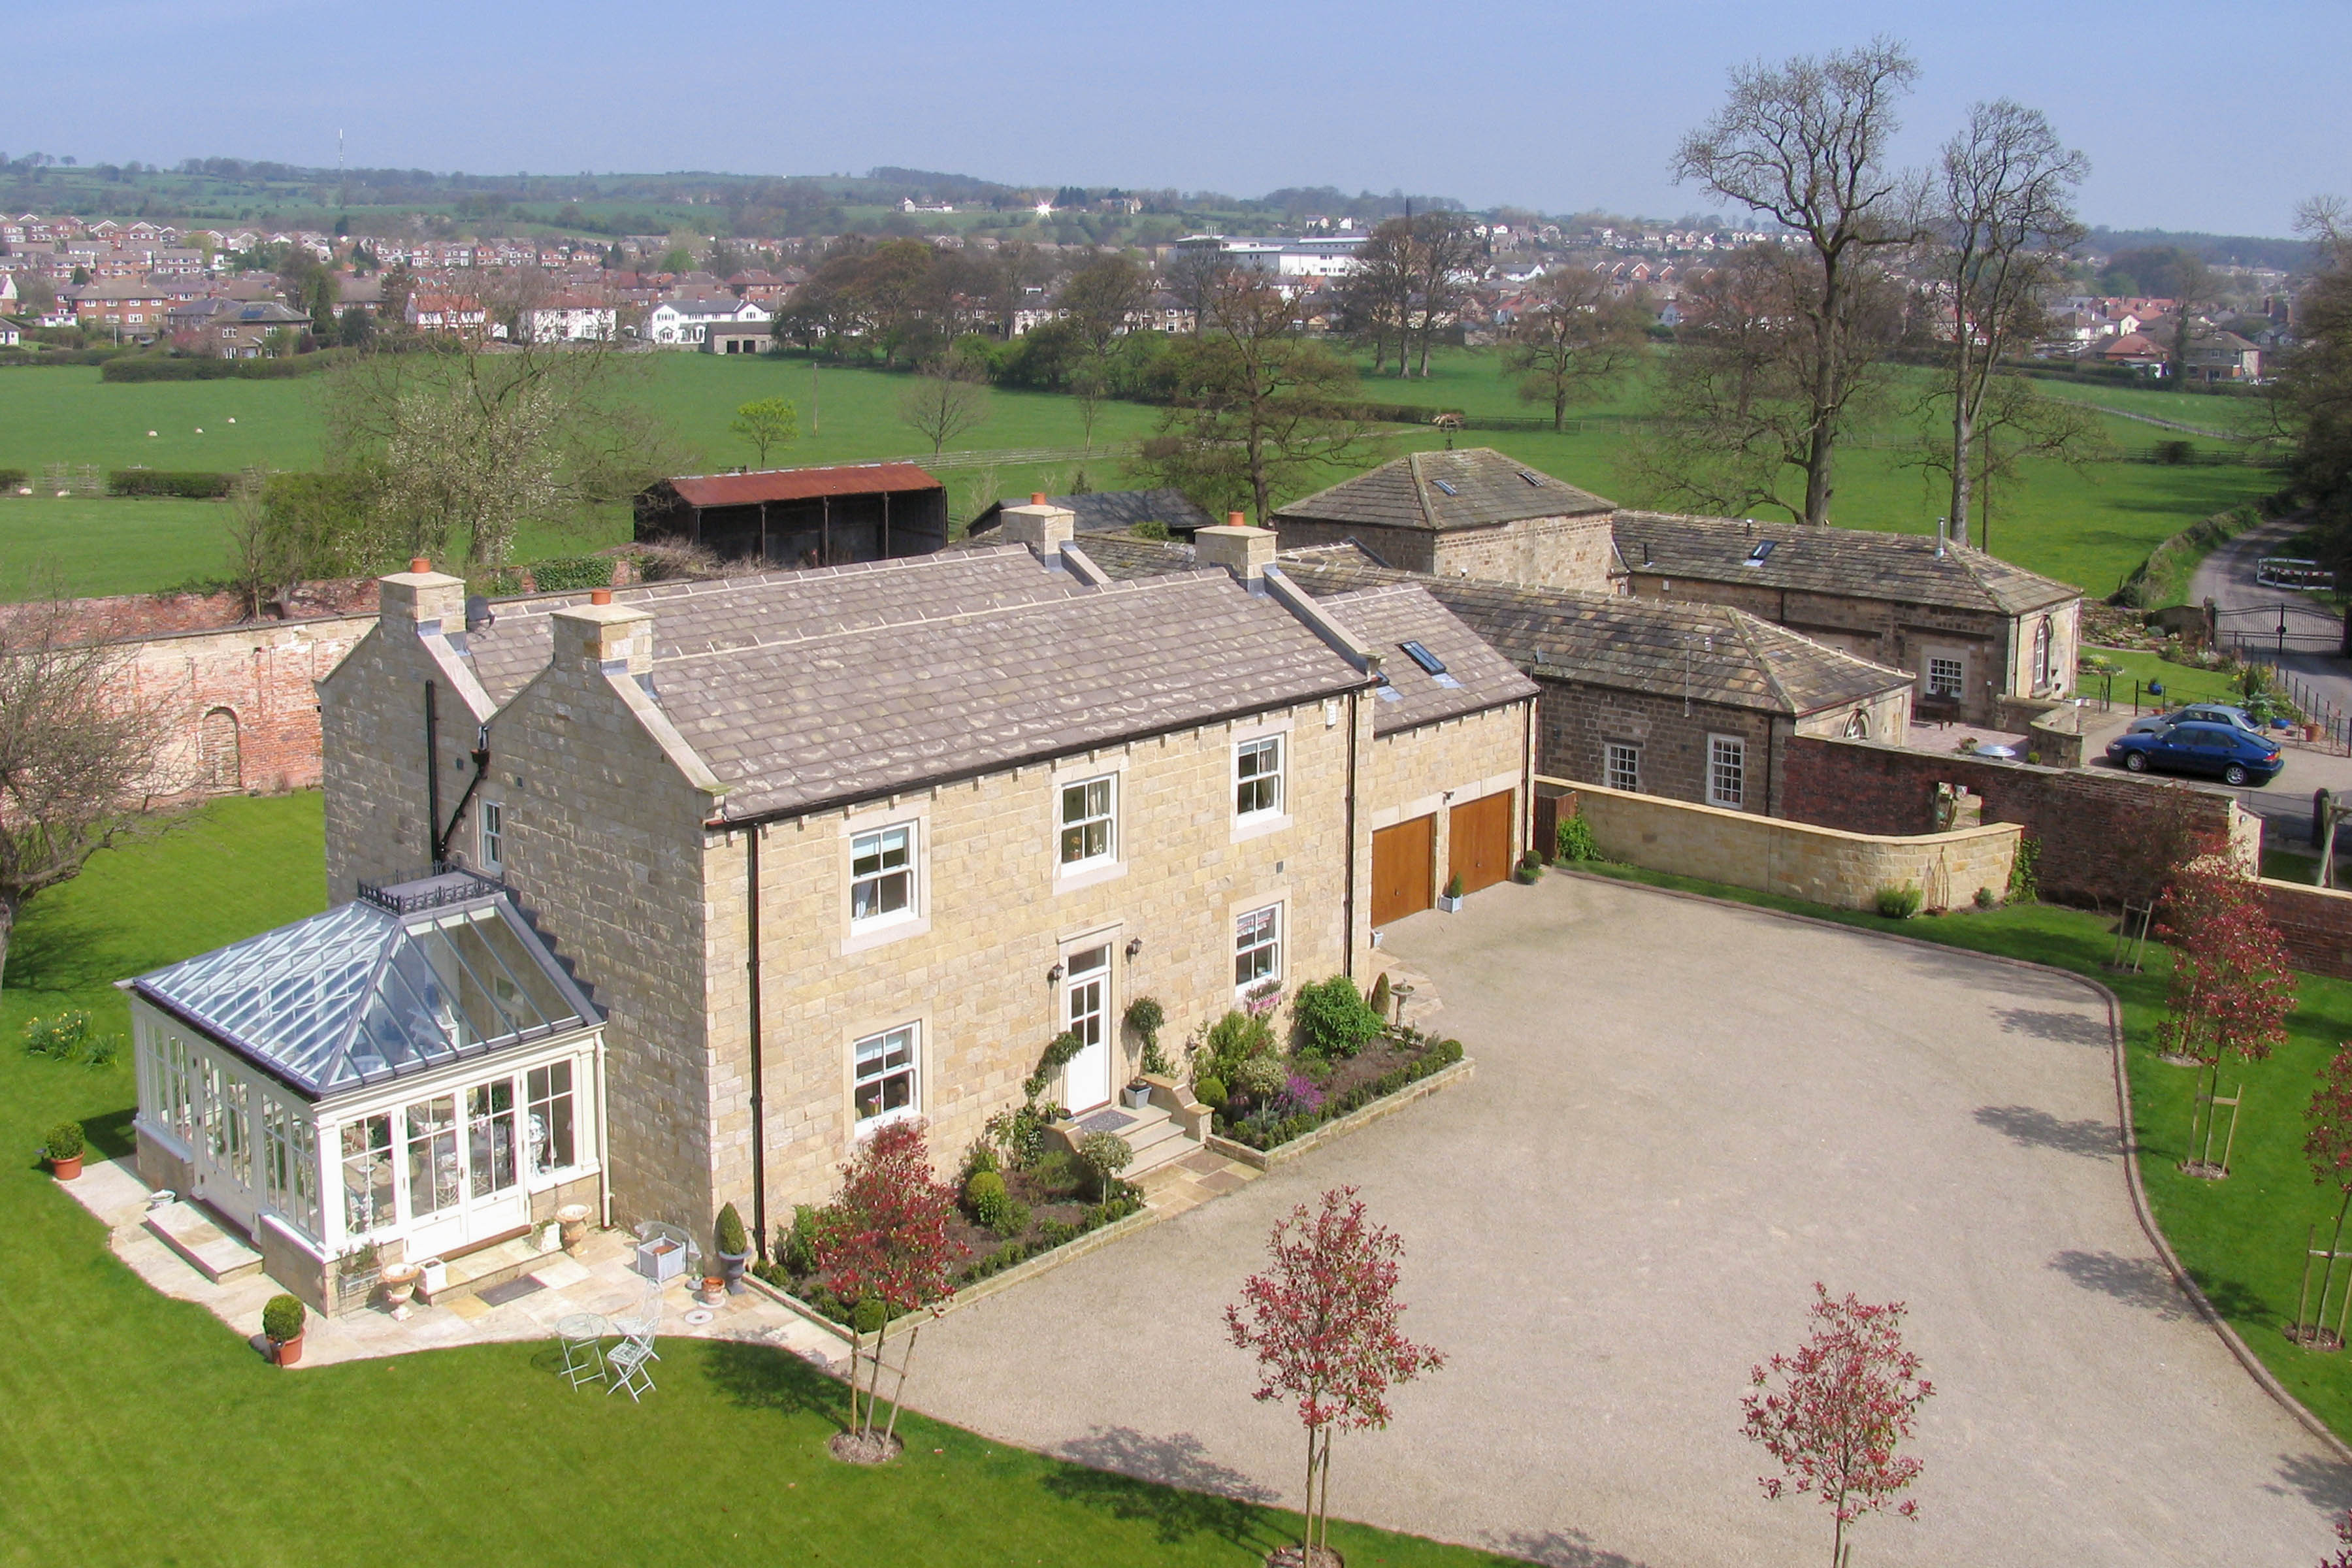 Erkulis | Ashfield Park Otley, Grade II Listed Conversion